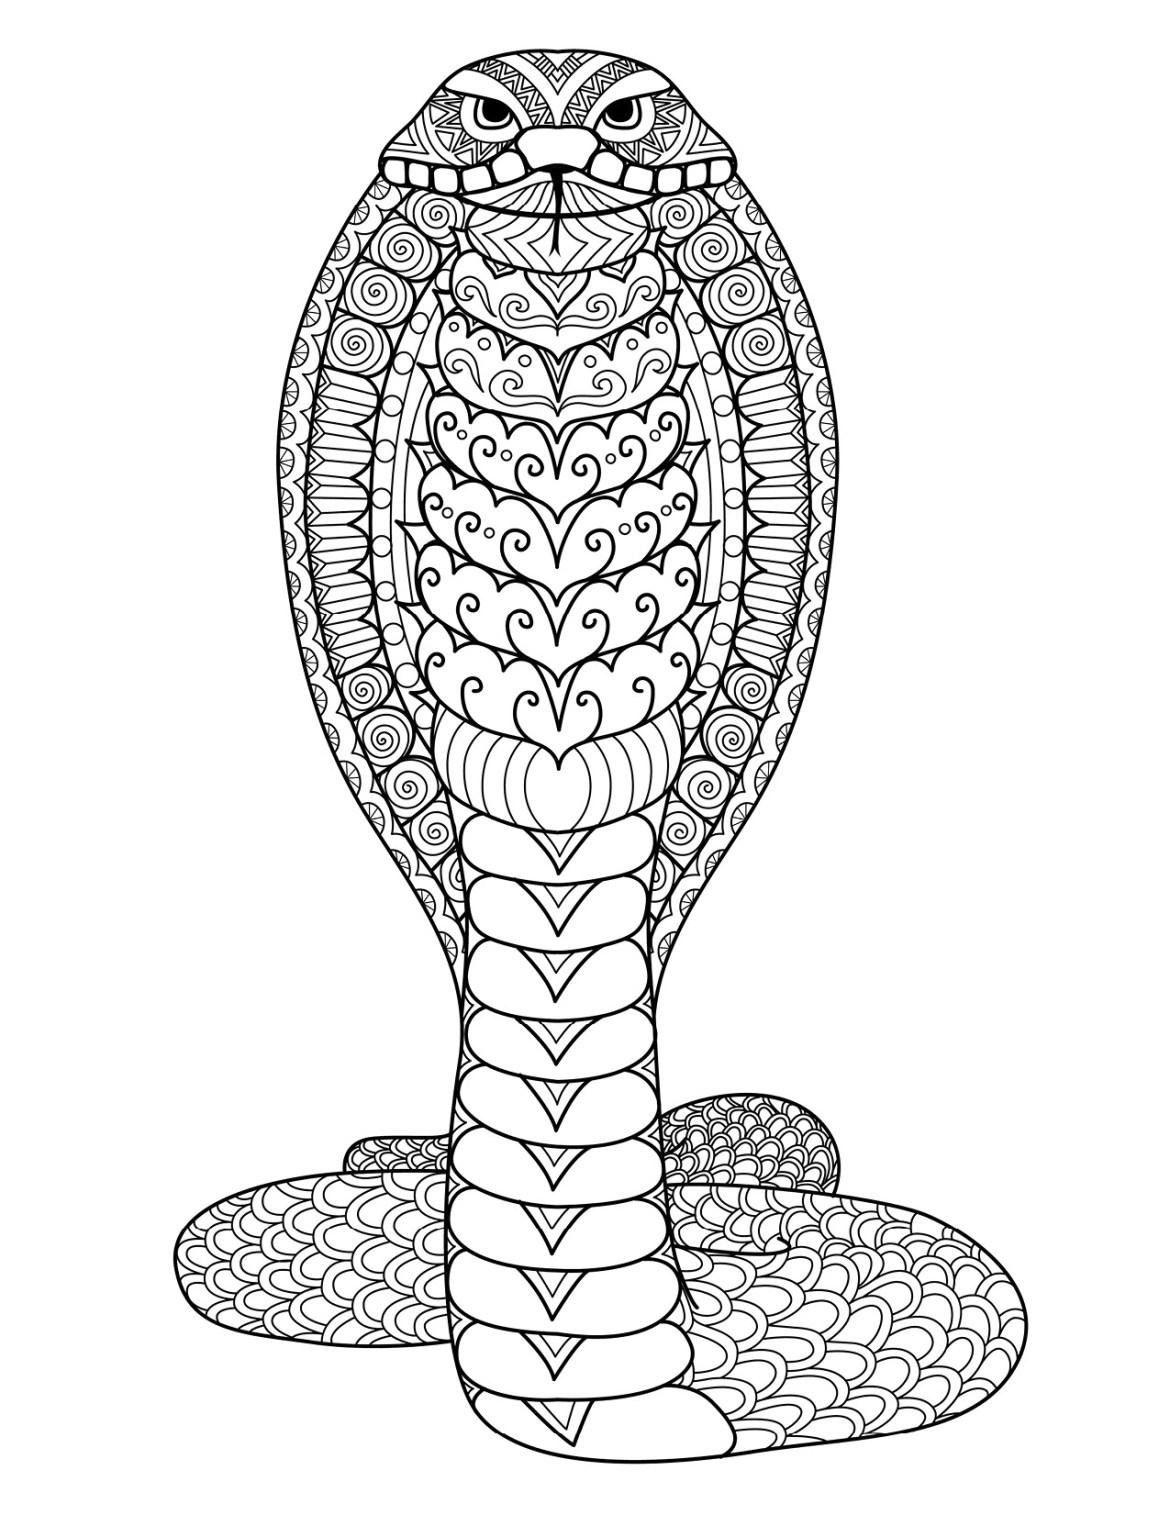 Coloriage gratuit serpent cobra à imprimer par Bimbimkha